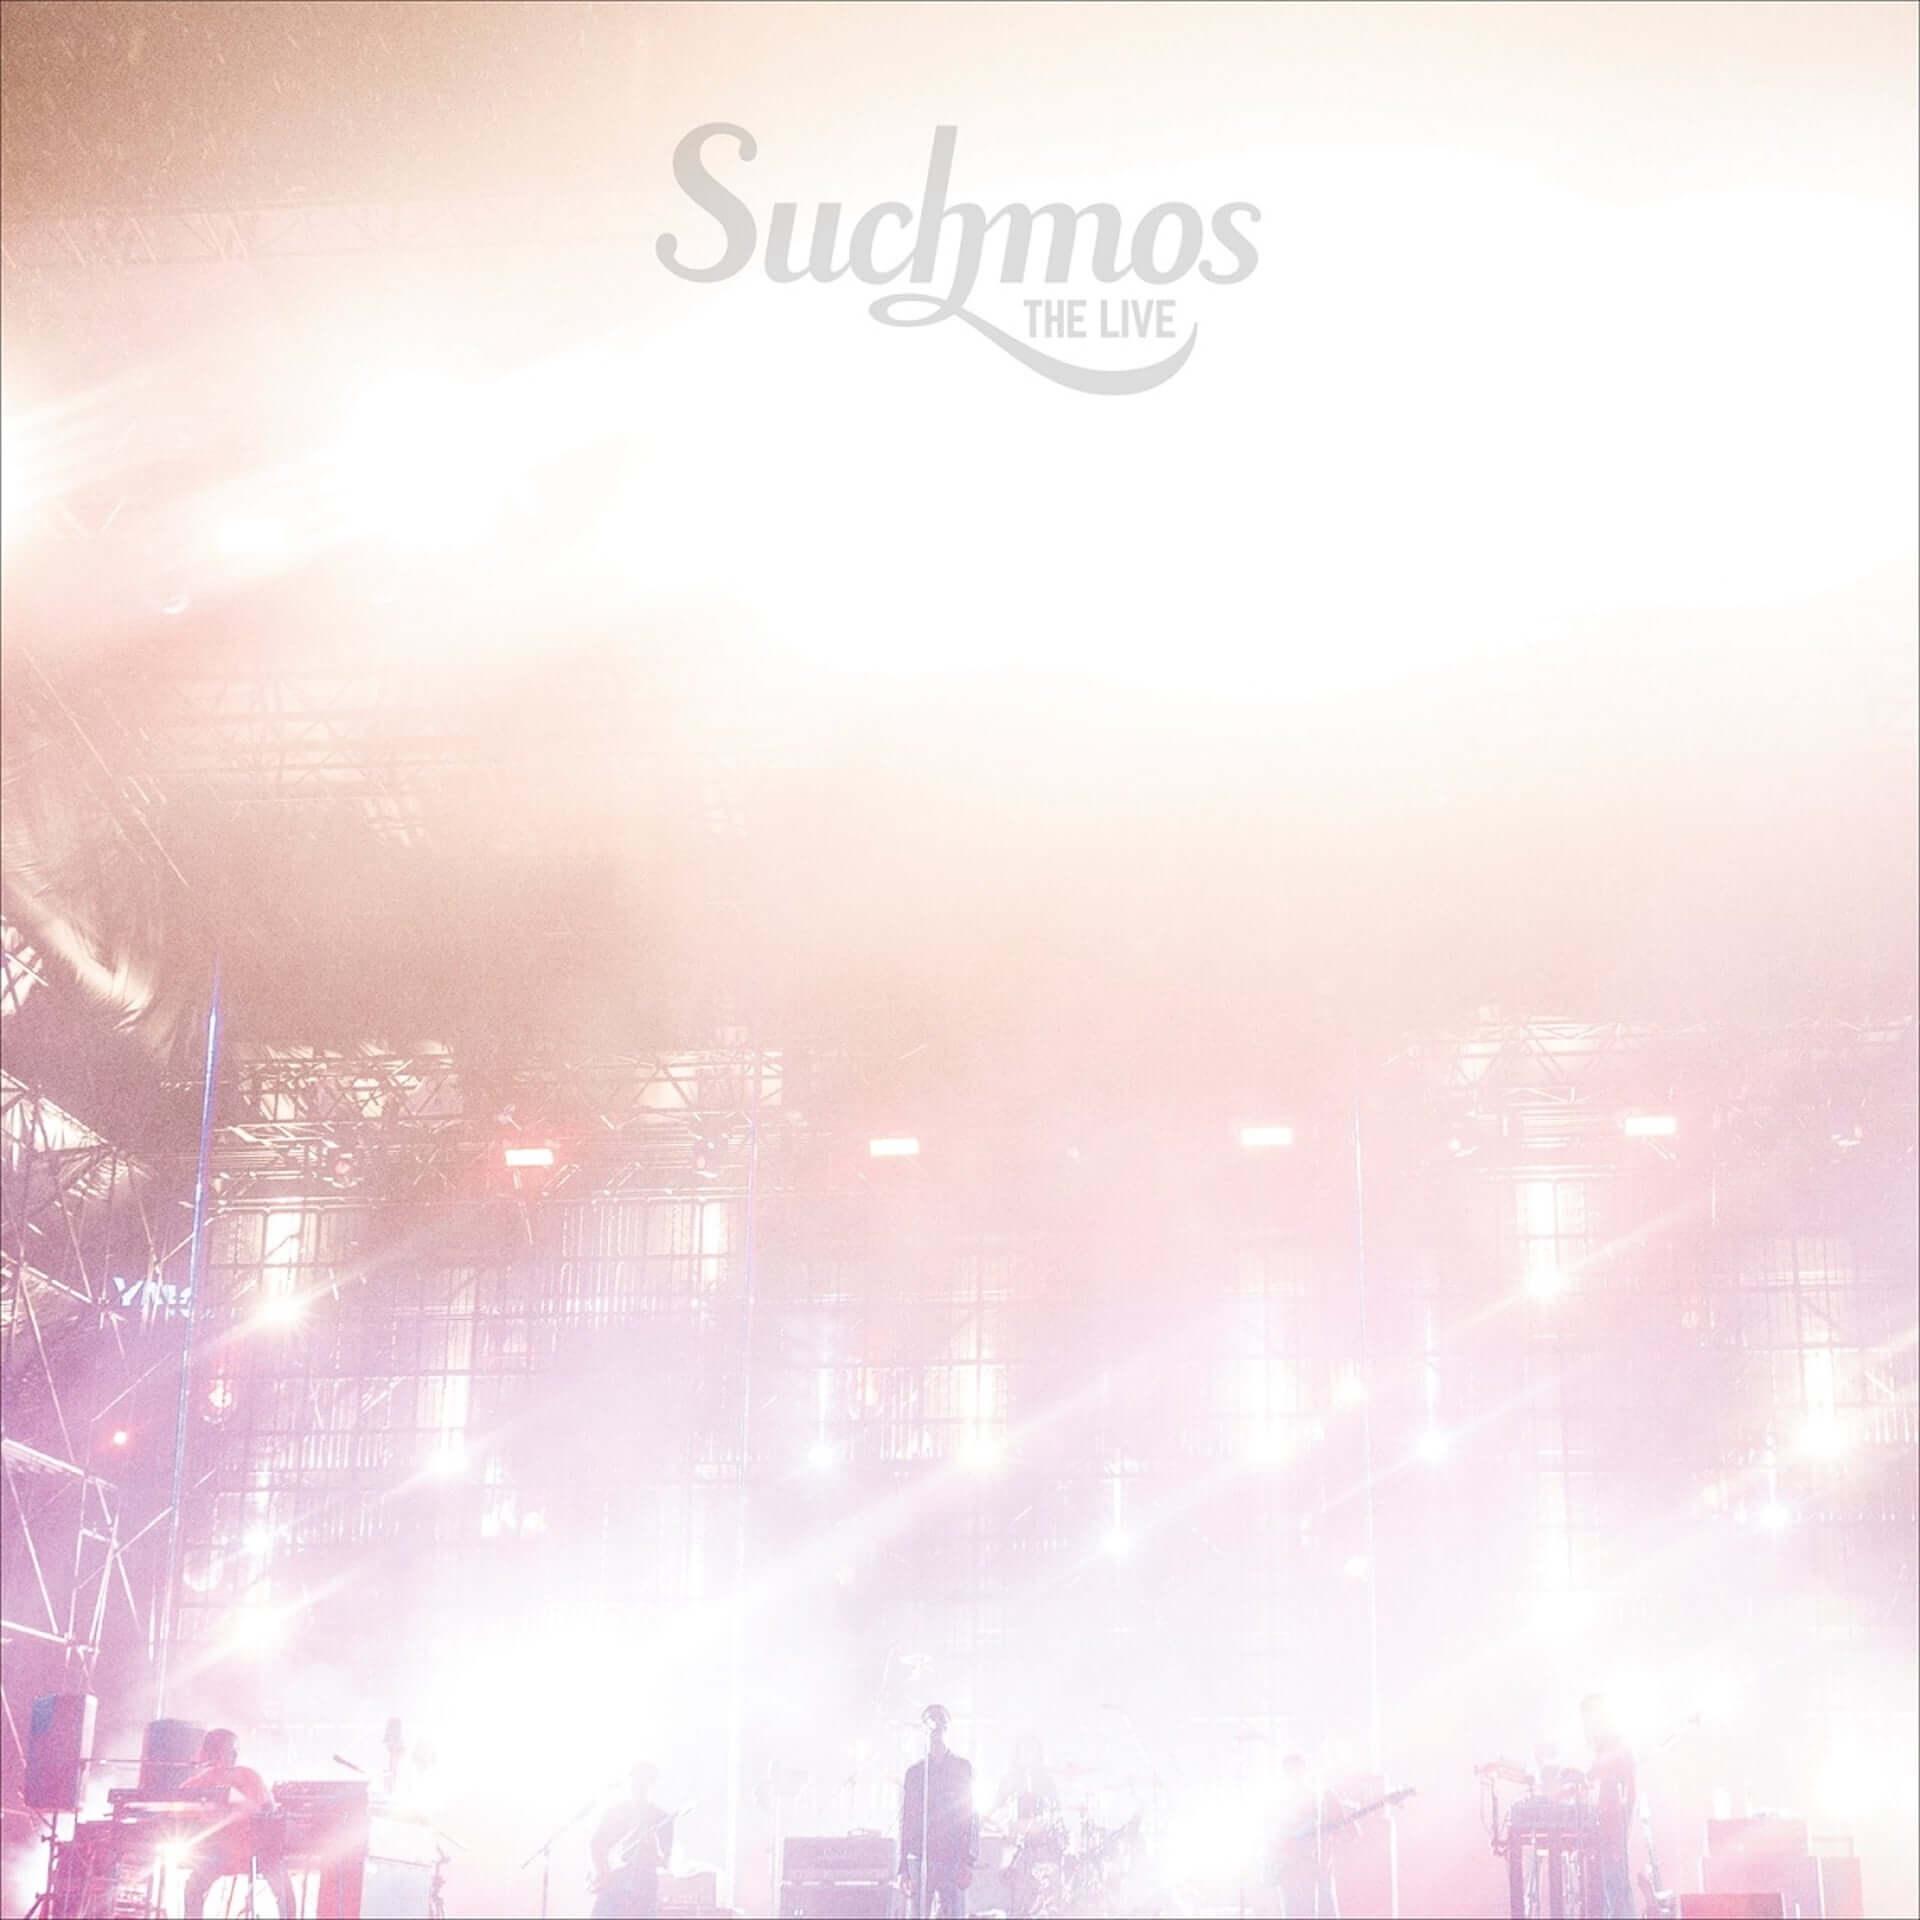 Suchmosの特設サイト内に「Suchmos room」が突如オープン|未公開ライブ映像含む貴重コンテンツが多数公開 music200610_suchmos_5-1920x1920